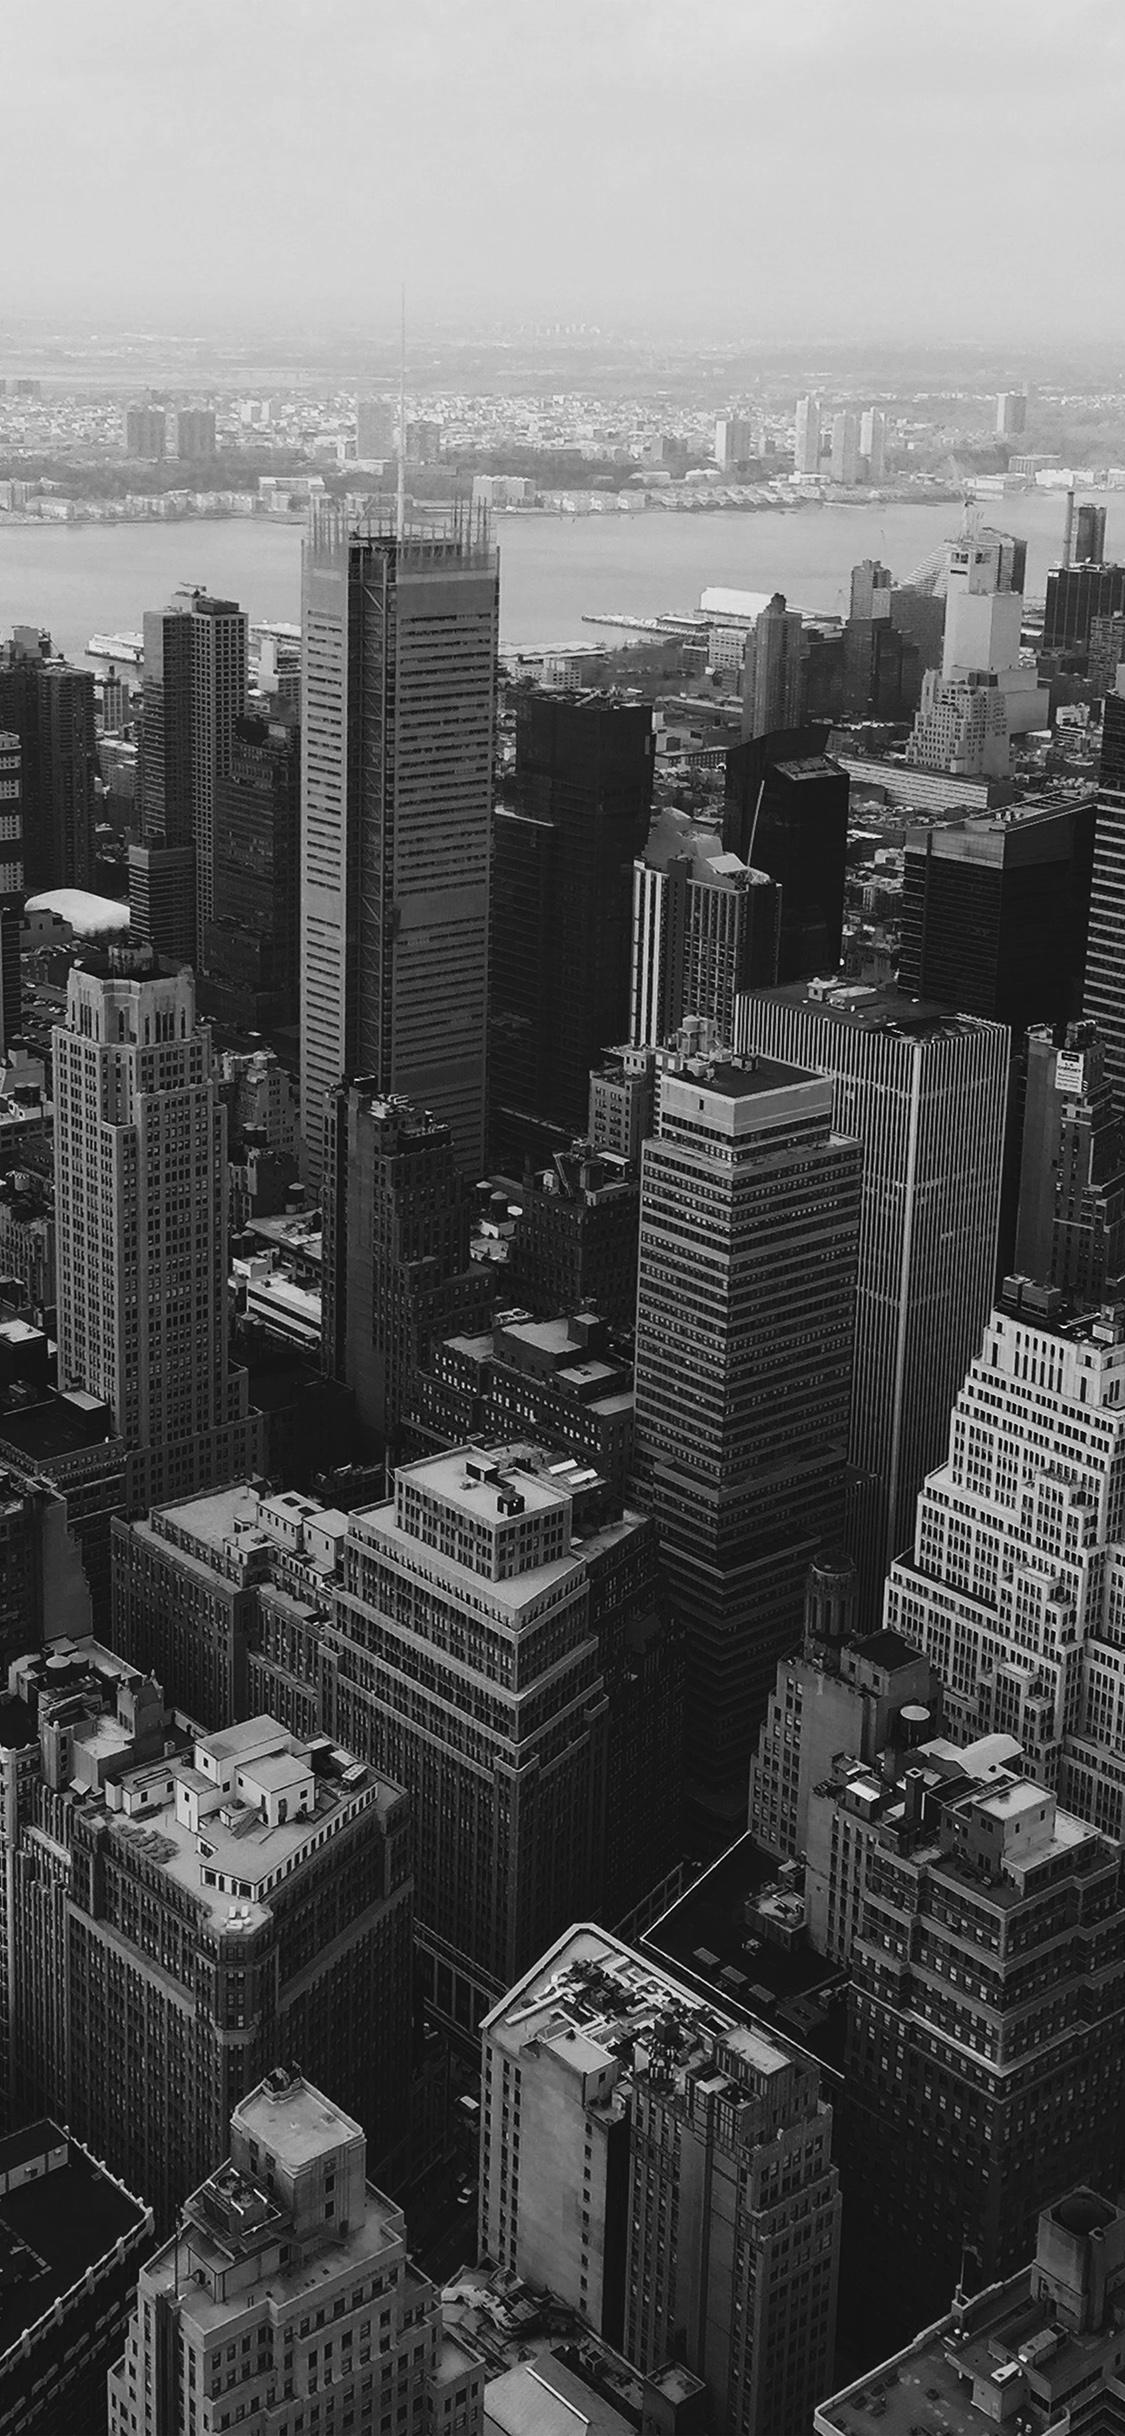 Mz14 Cityview Sky Newyork Hm River Bw Dark Wallpaper